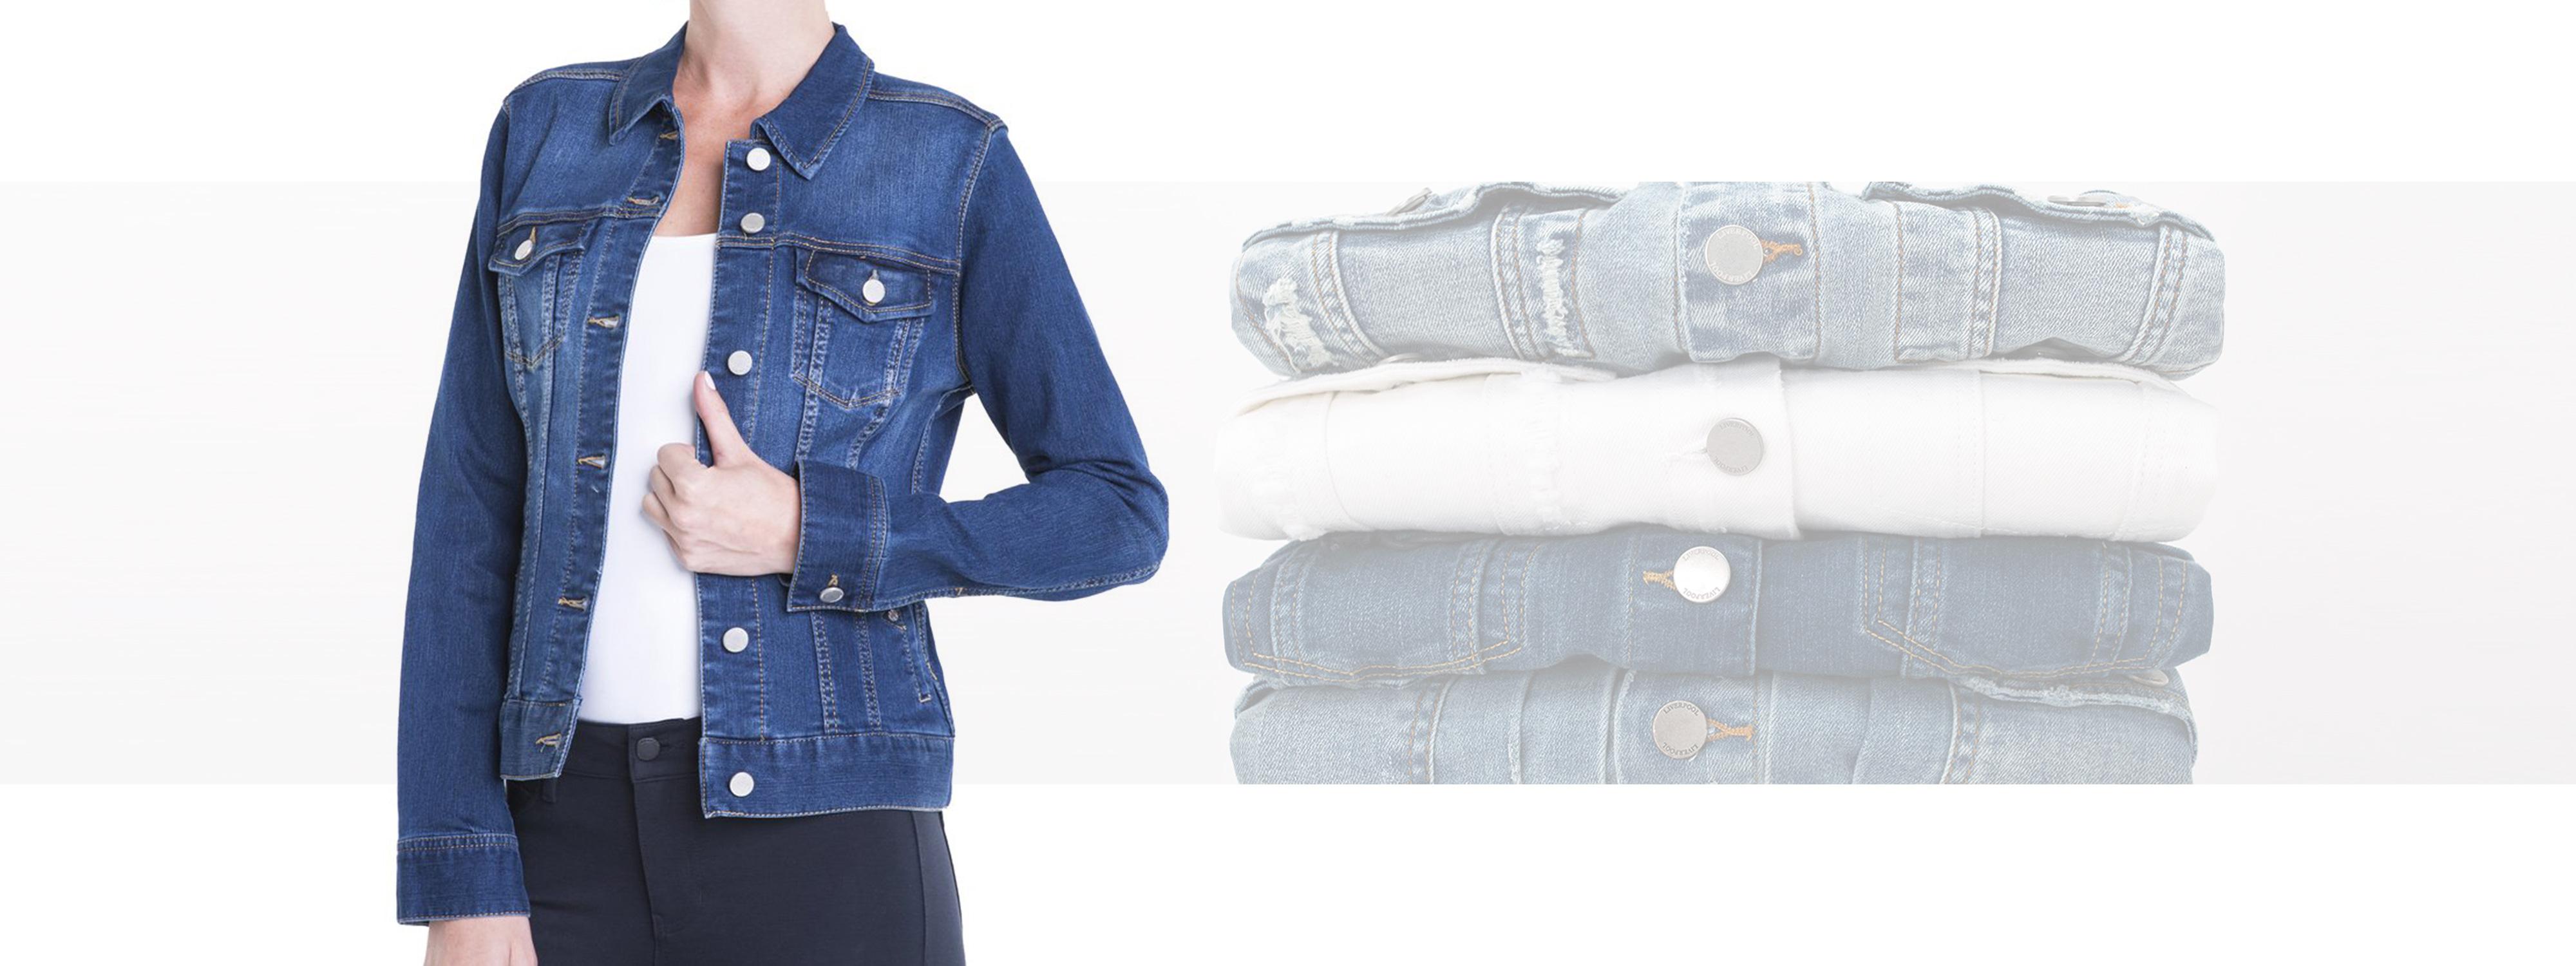 knuths-liverpooljeans-denim-jacket